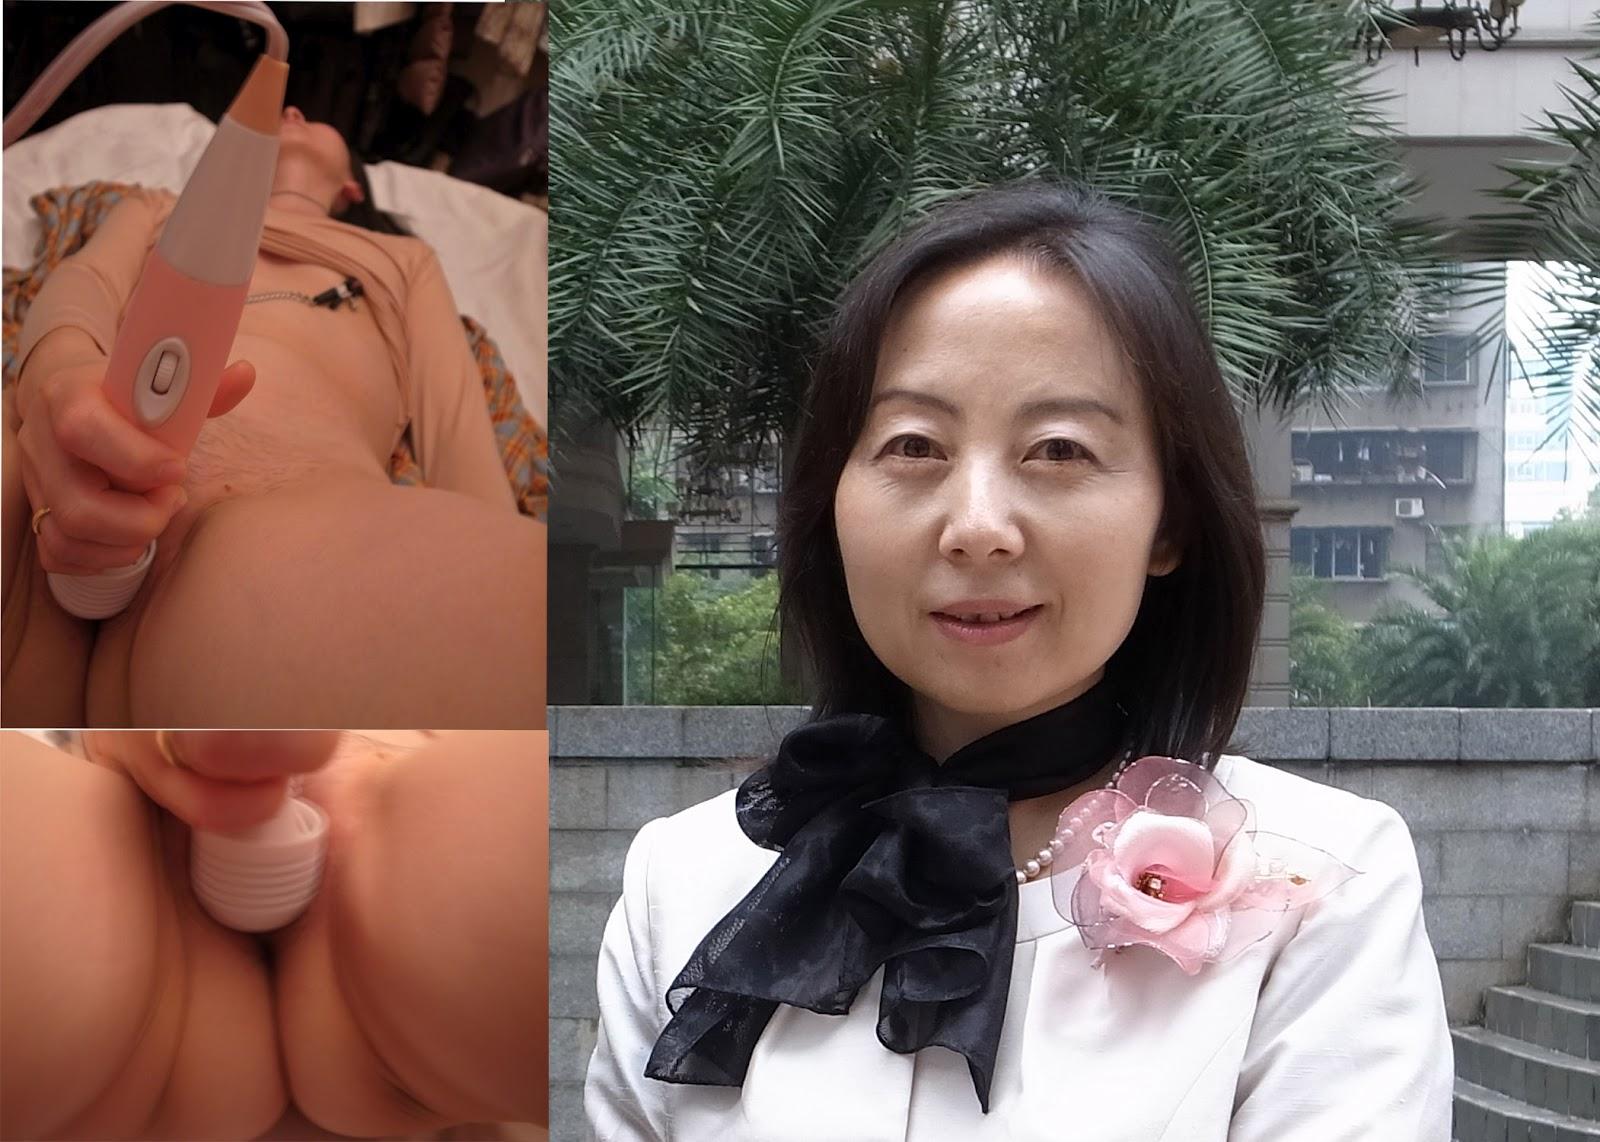 Uncensored japanese porn star rumi kurosaki hitachi toy 6